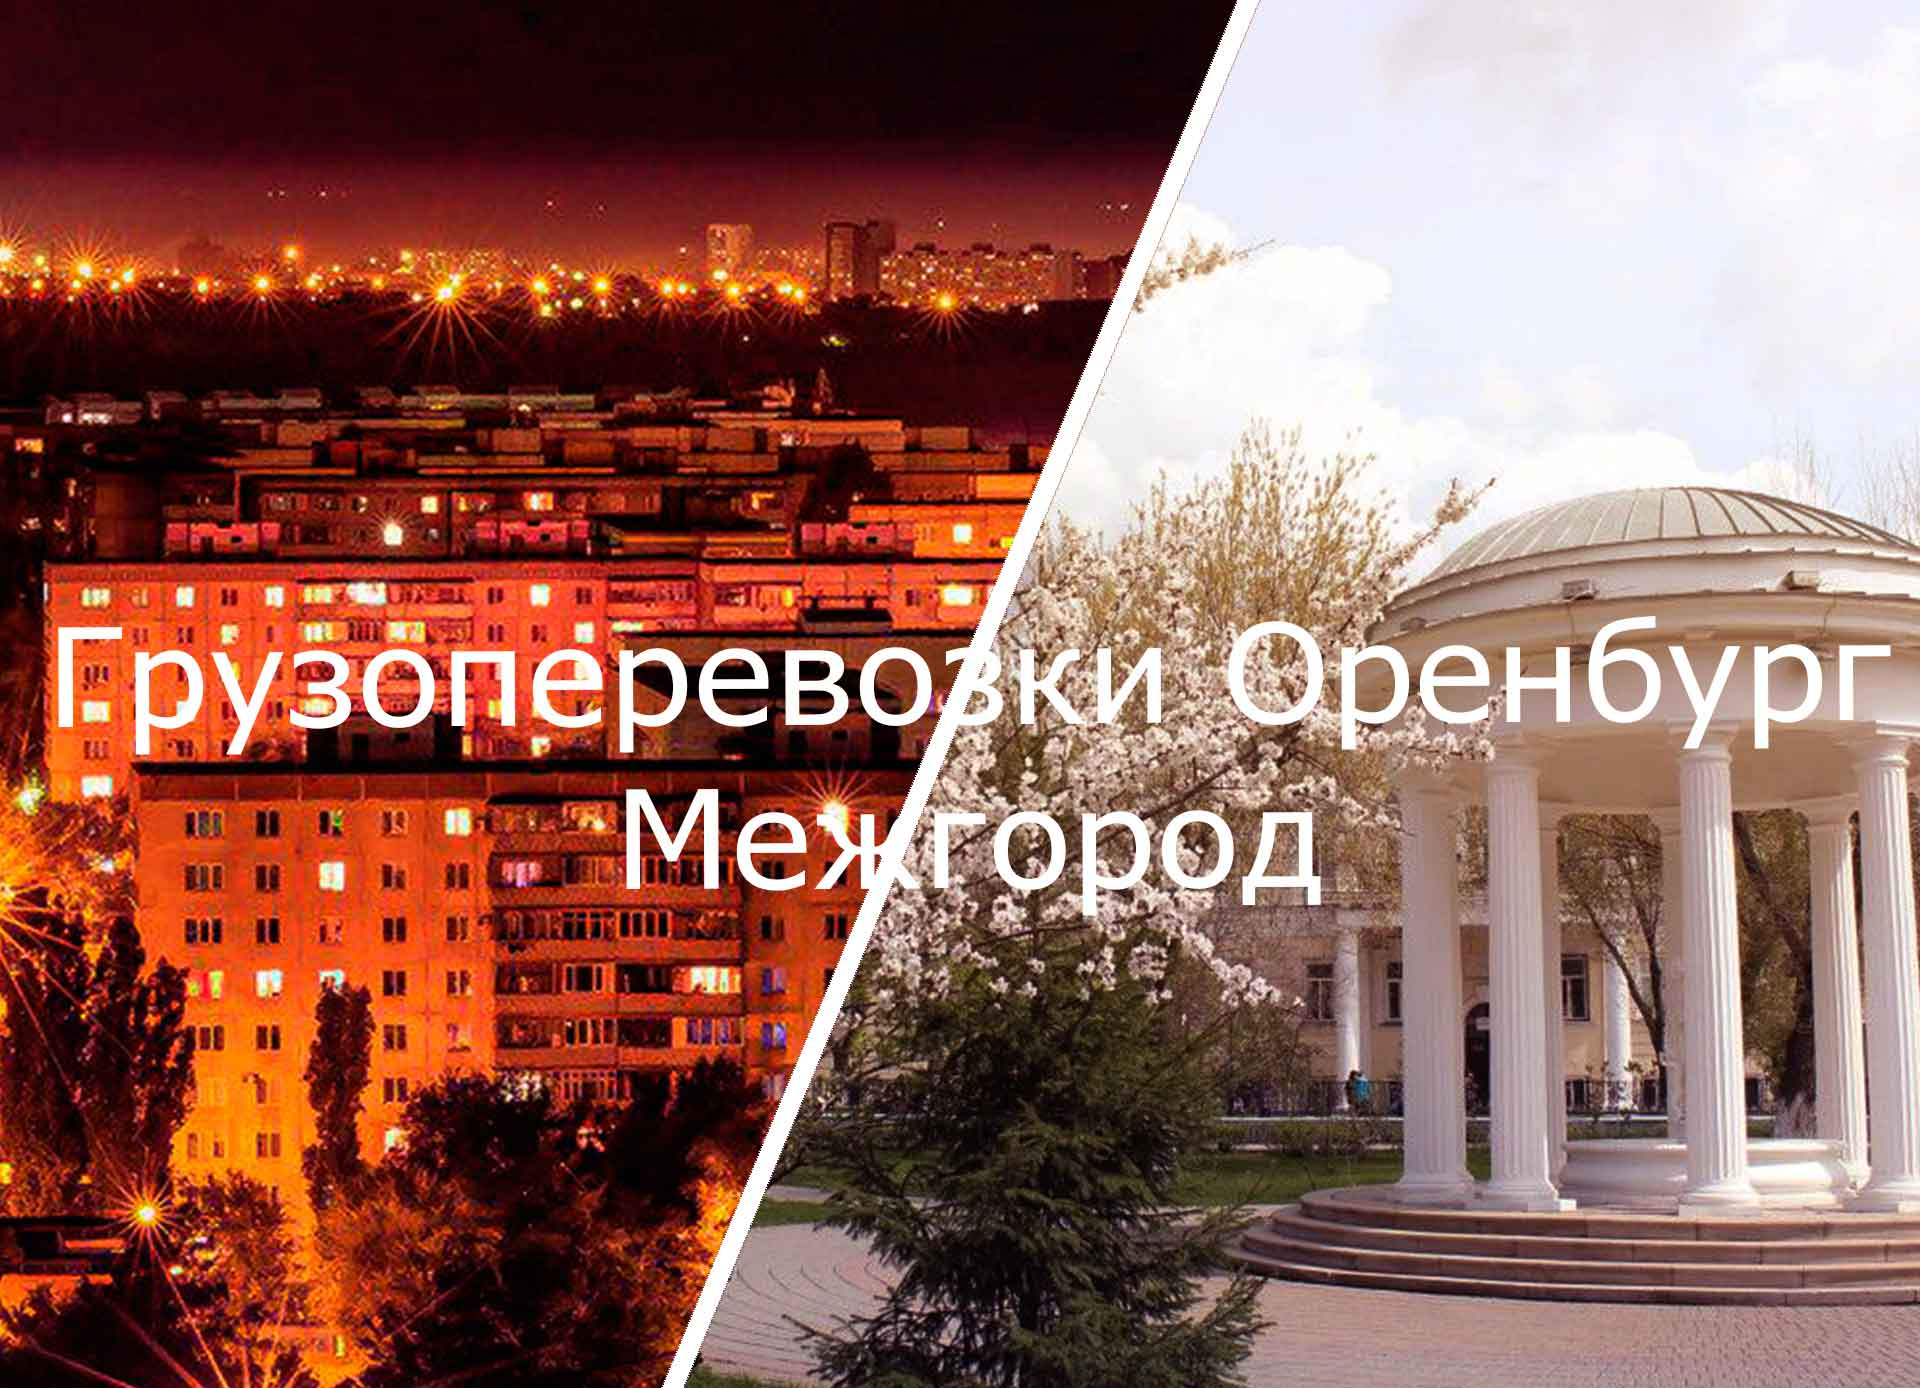 грузоперевозки оренбург межгород